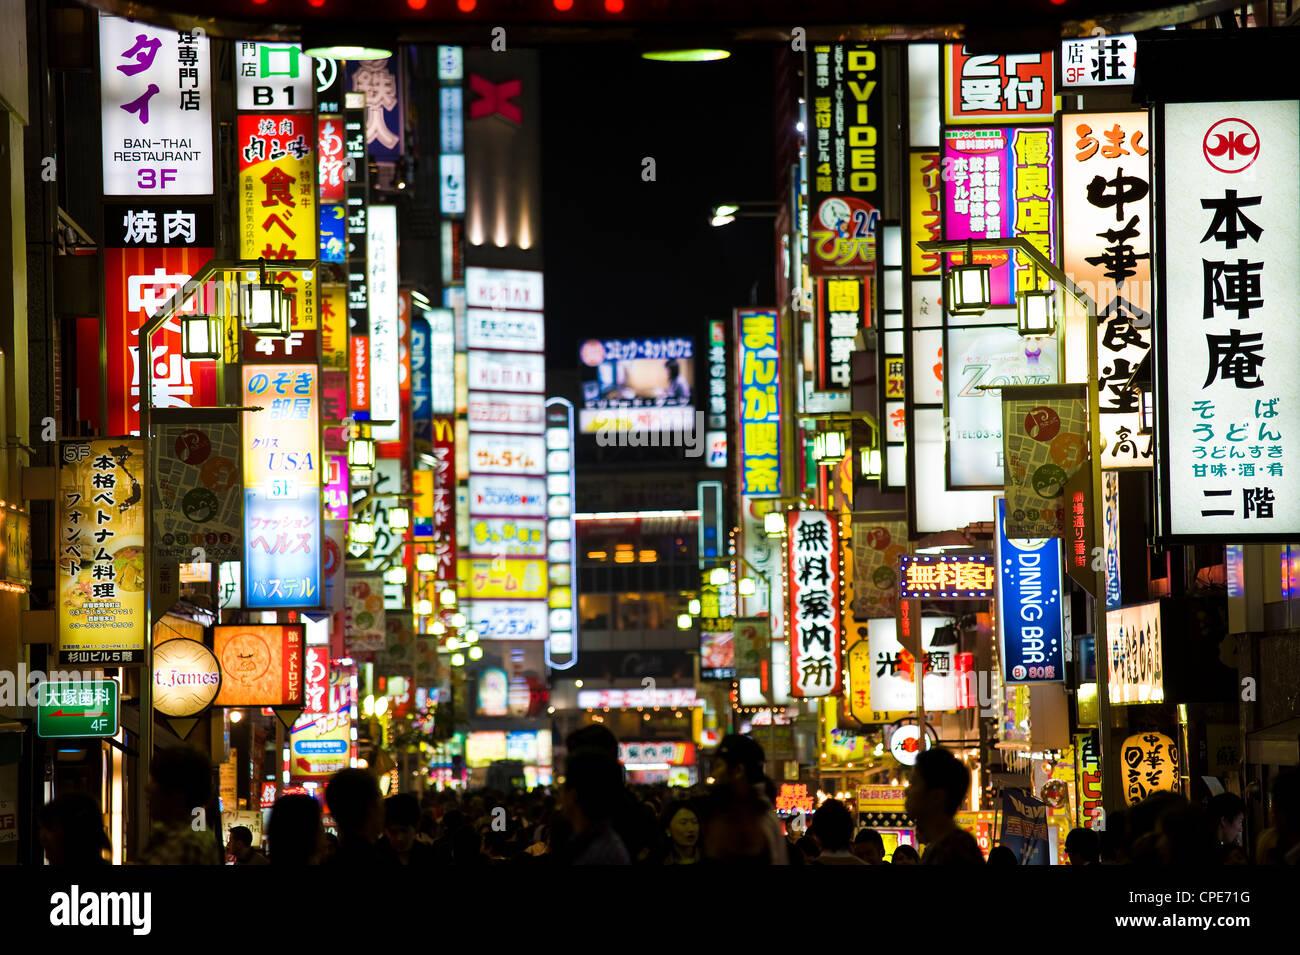 Neon signs, Kabukicho, Shinjuku, Tokyo, Japan, Asia - Stock Image